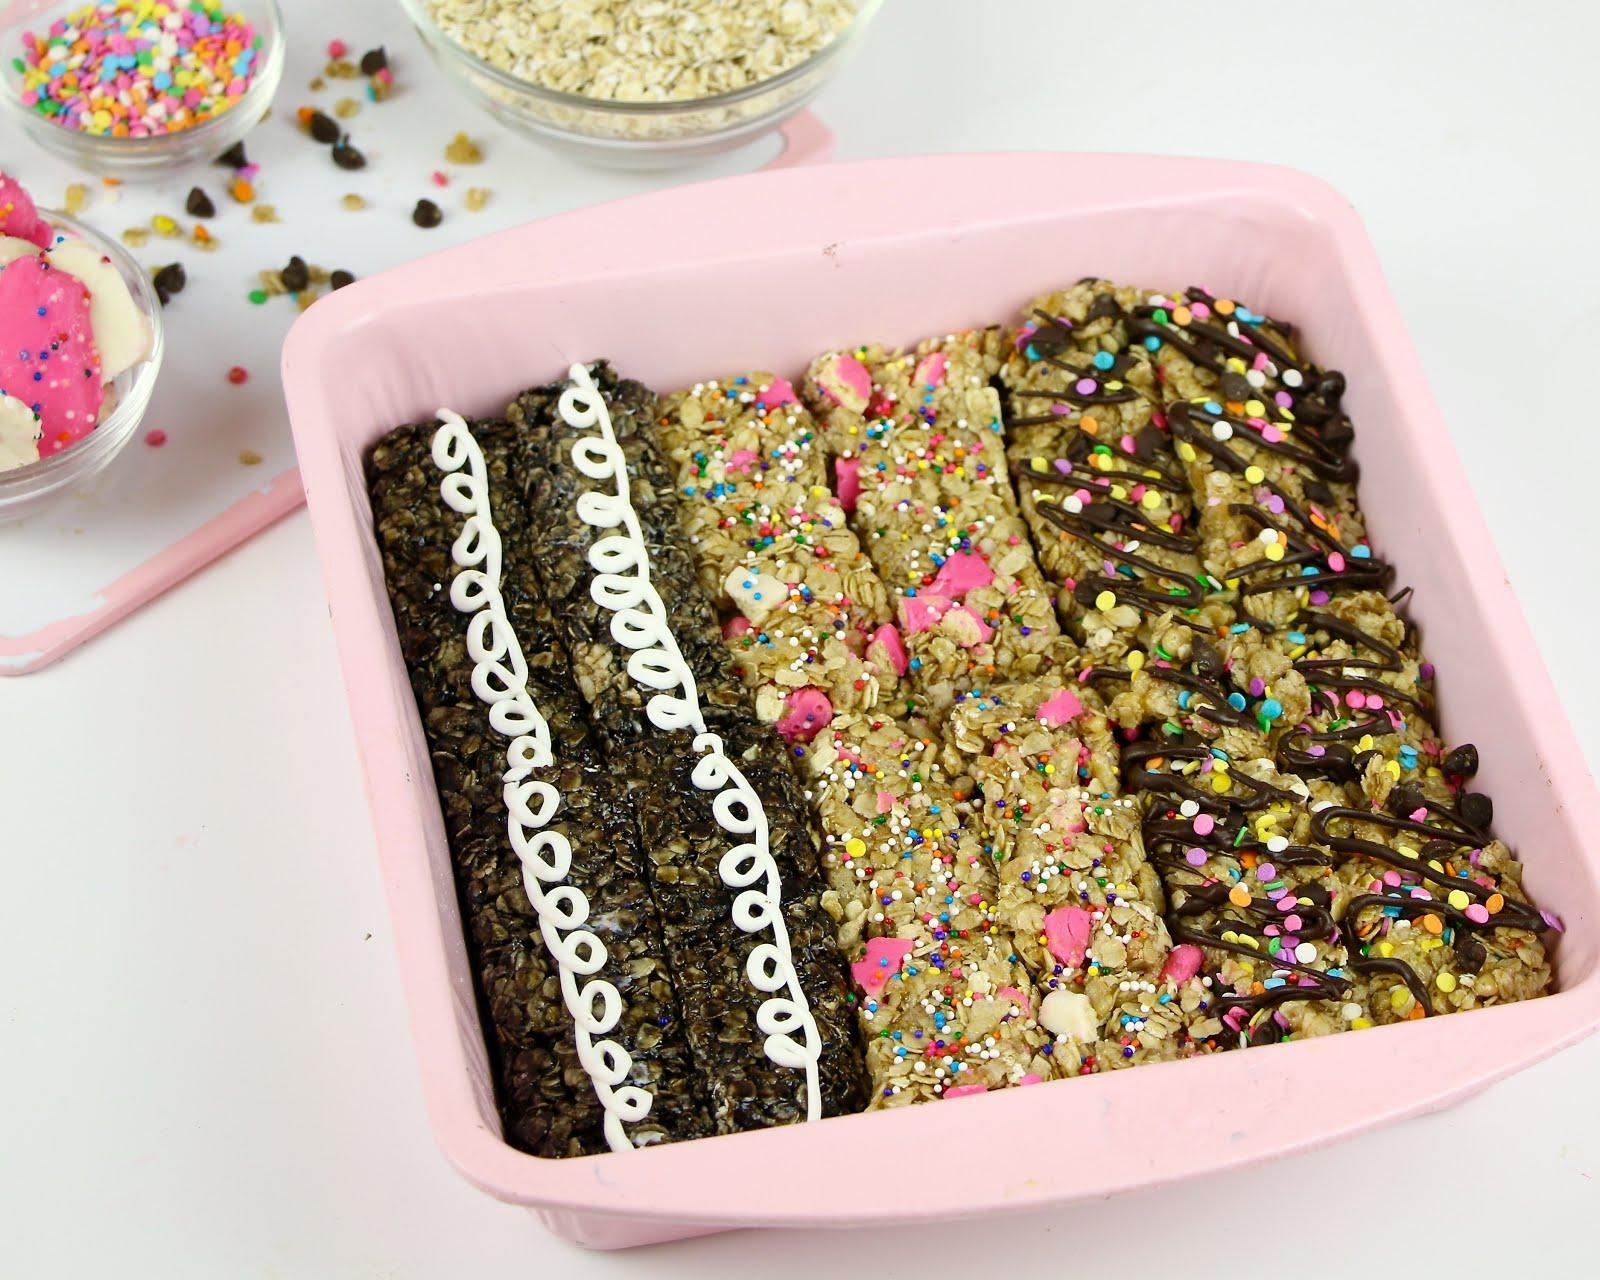 Video No Bake Dessert Granola Bars Hostess Cupcake Circus Animal Cookie Birthday Cake Flavored The Lindsay Ann